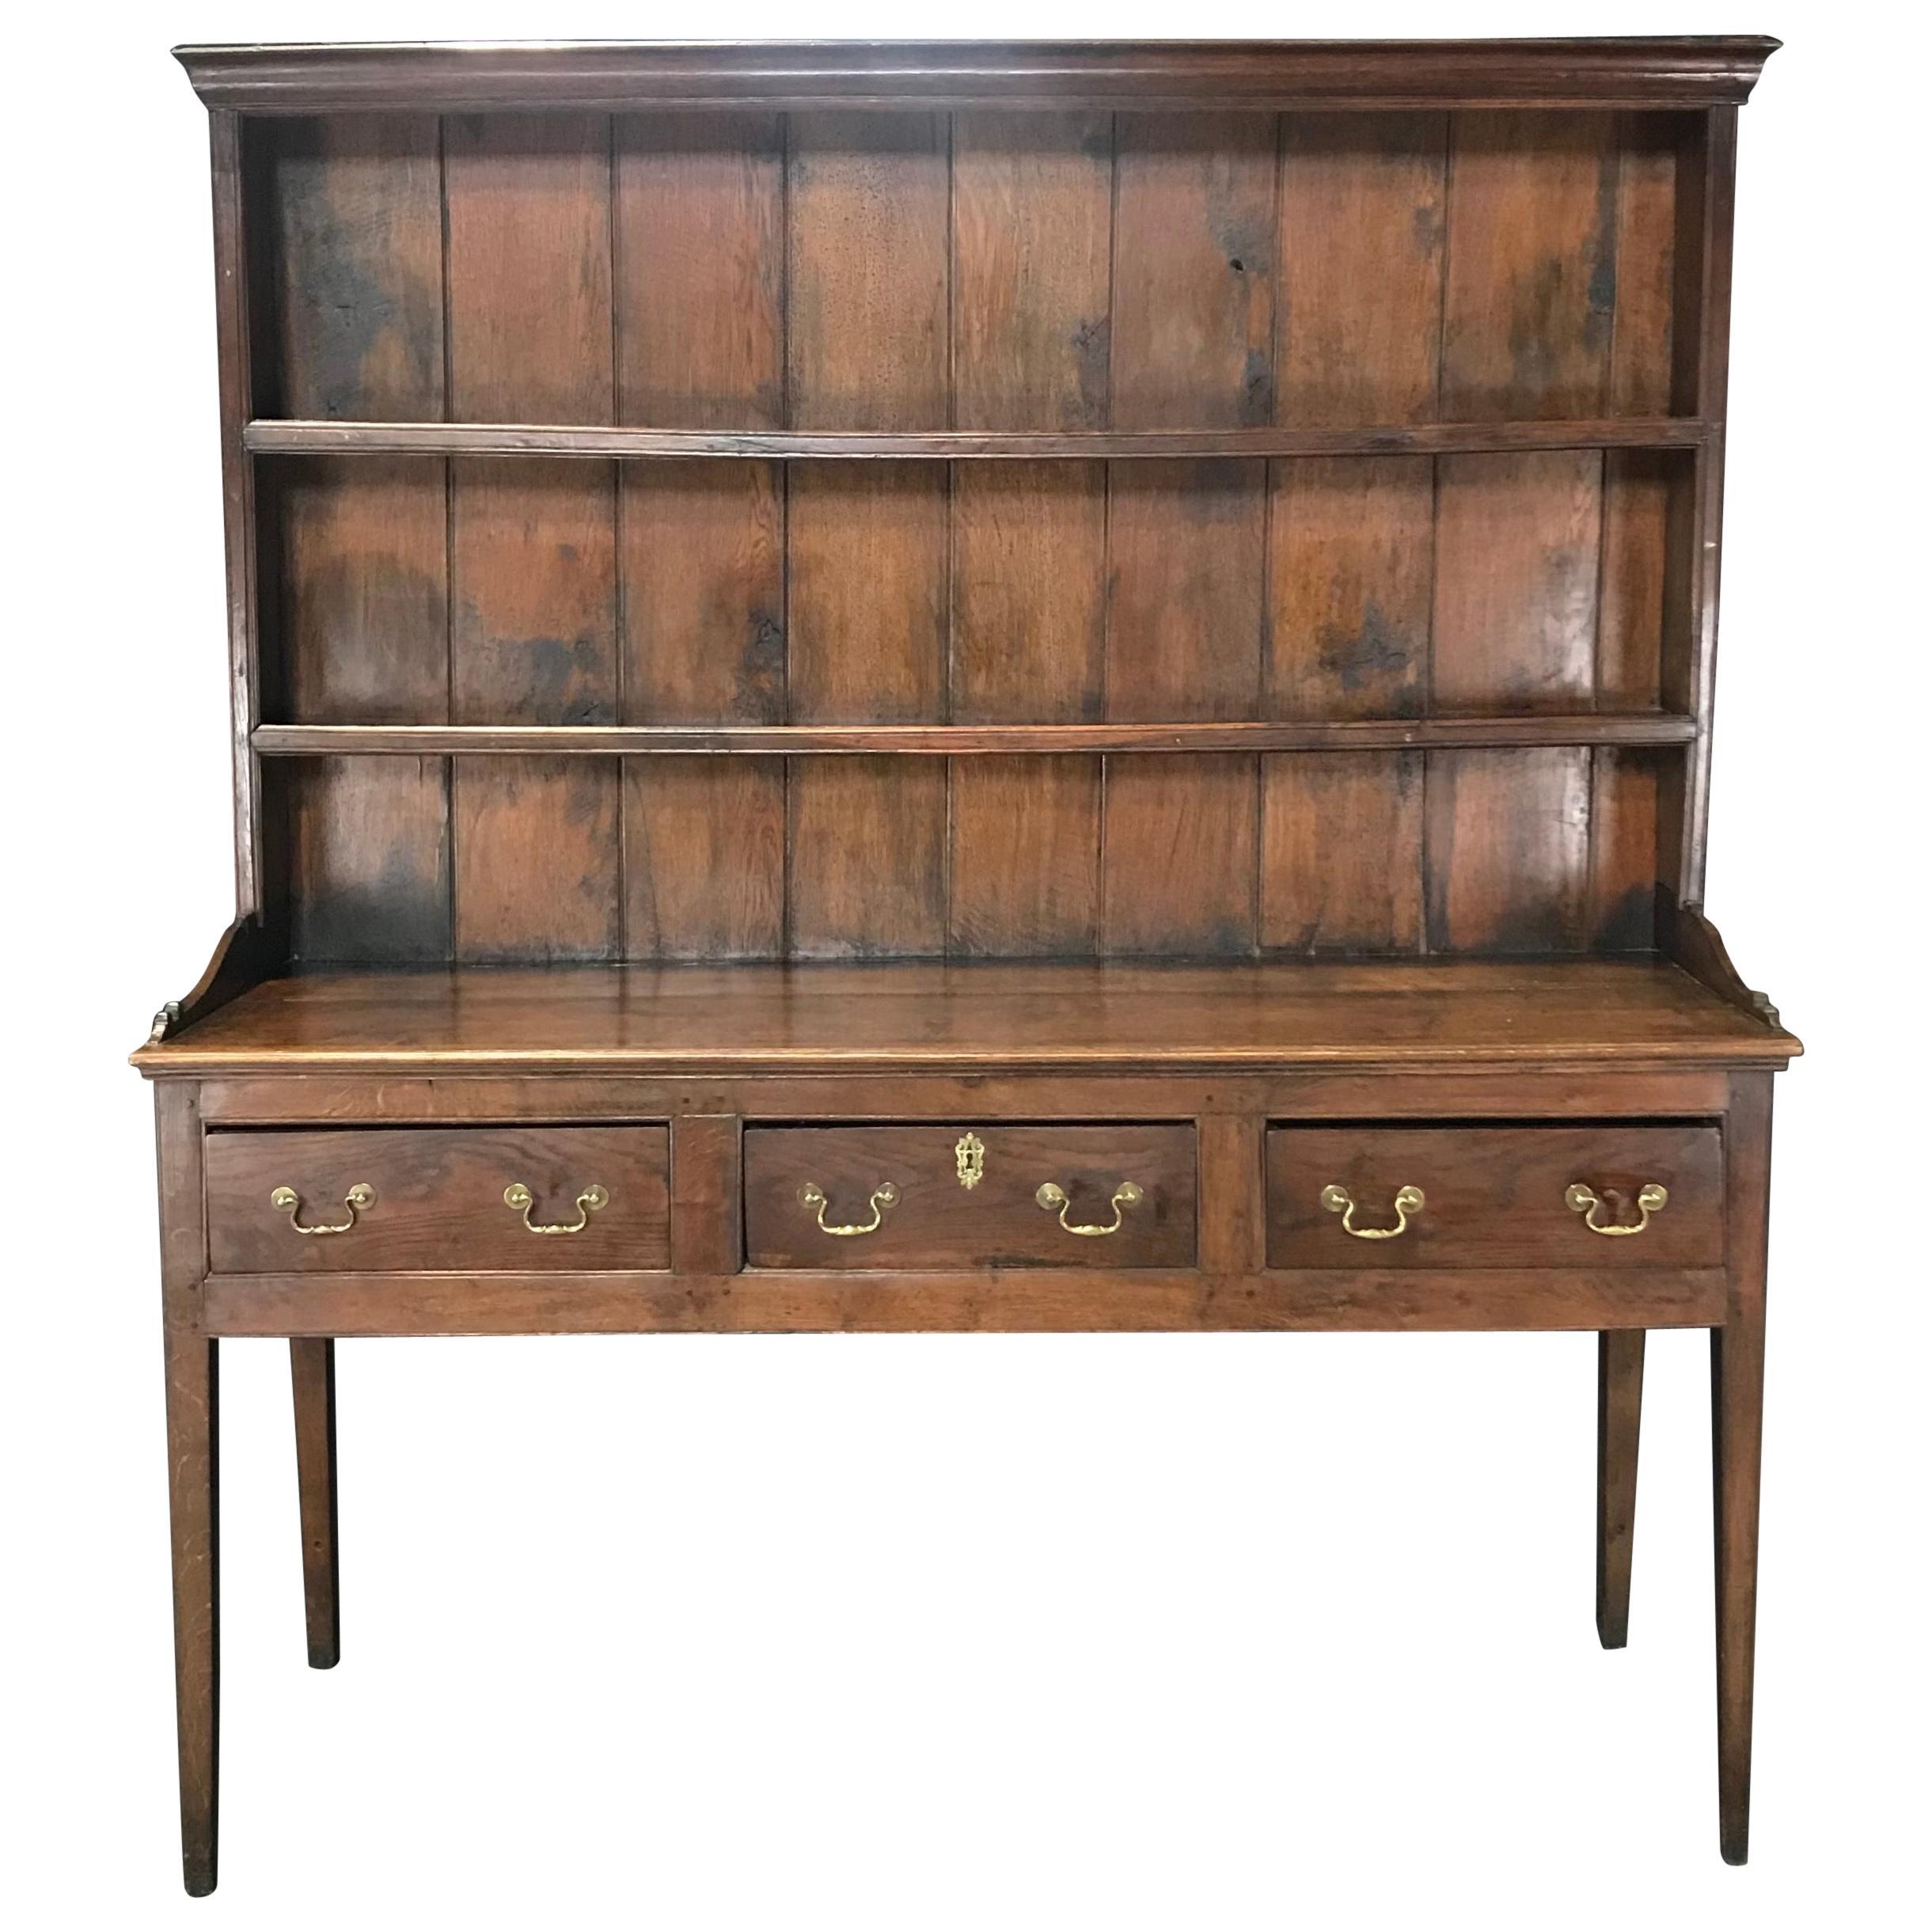 Warm 19th Century Large Oak English China Cupboard Sideboard Cabinet